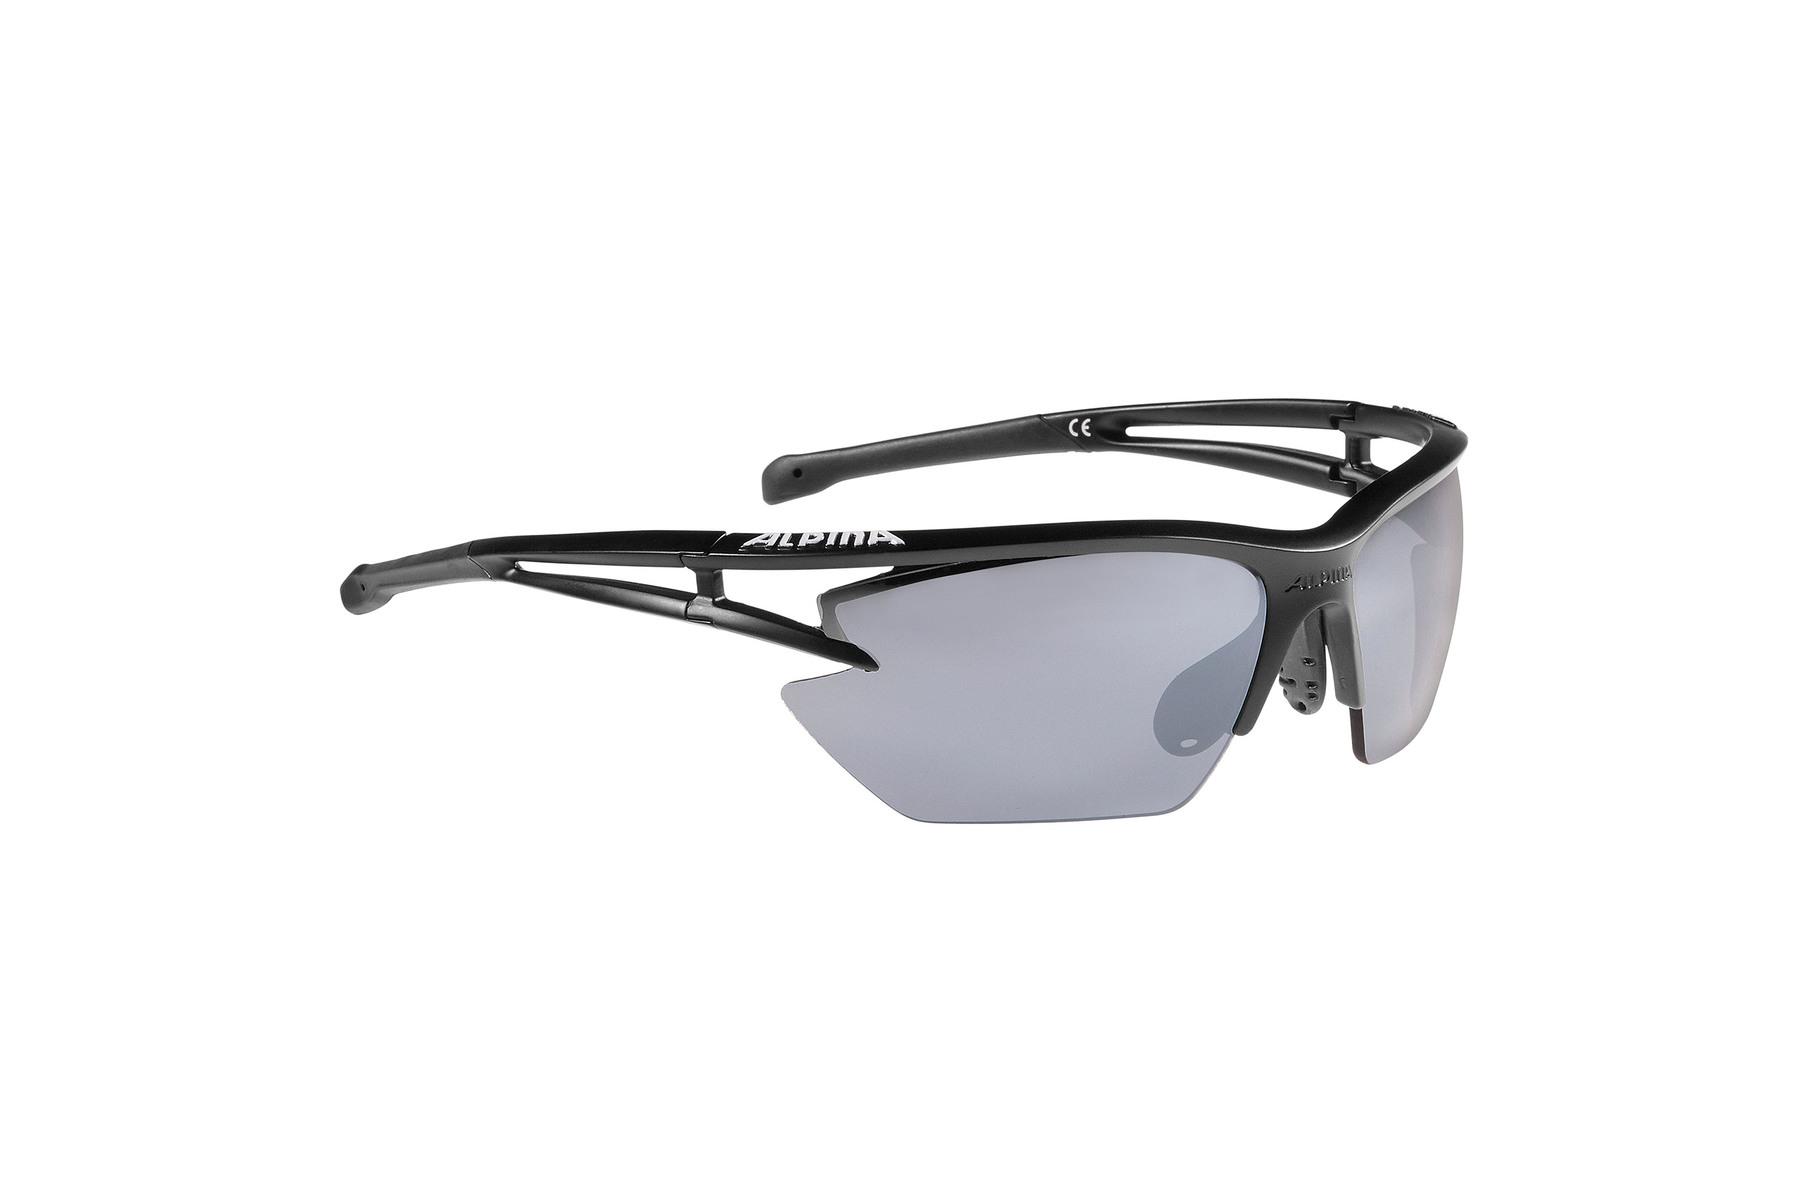 Alpina Sportbrille EYE-5 HR S CM+ - black matt-blue 7MF7Cz8K8